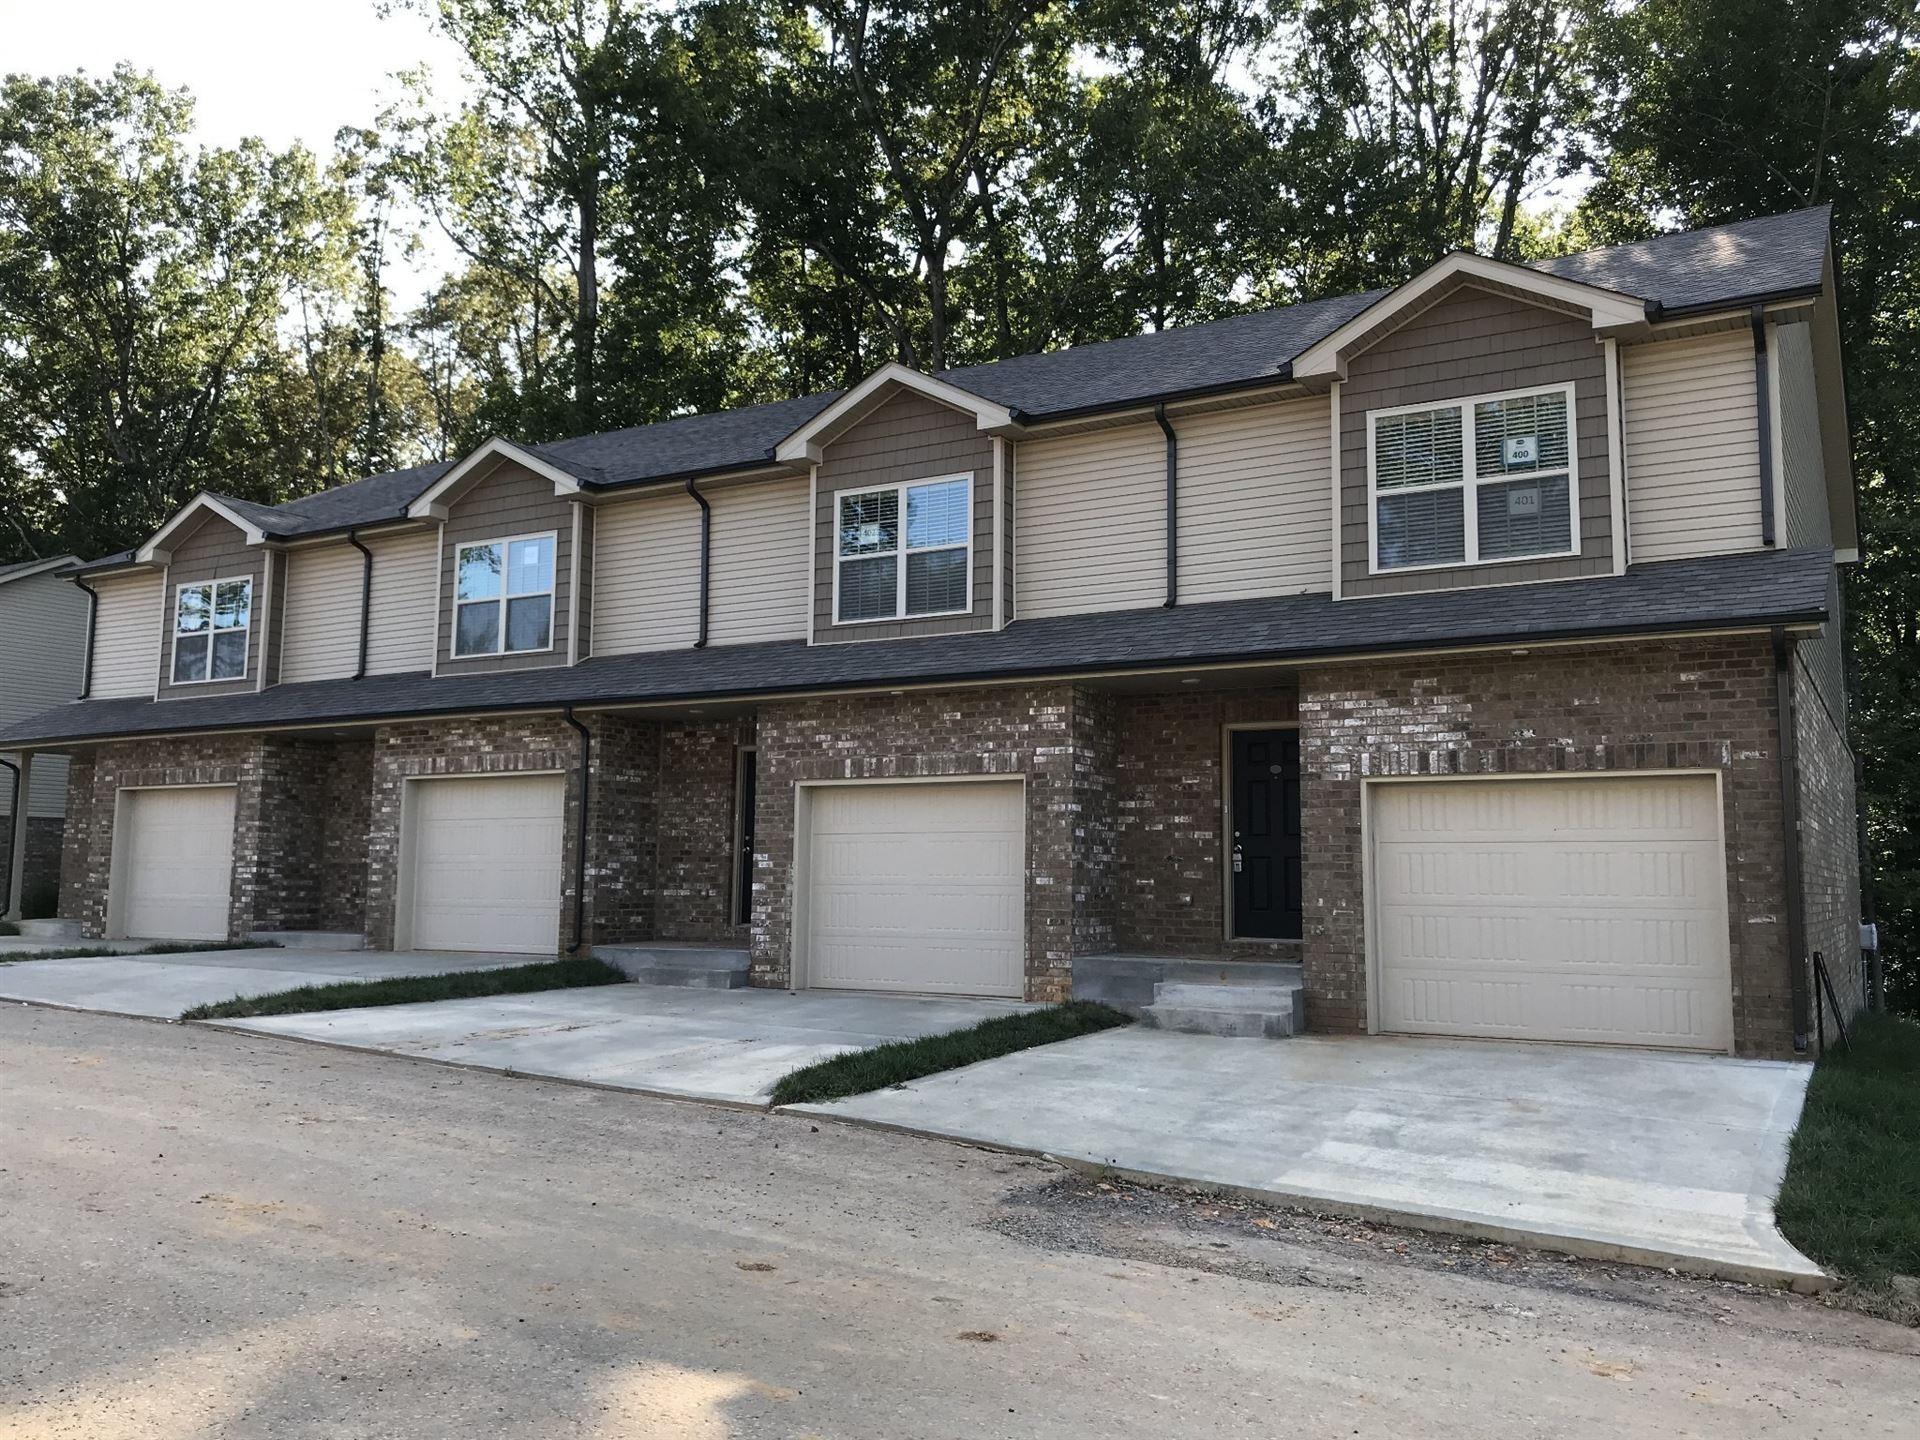 135 Country Lane Unit 802, Clarksville, TN 37043 - MLS#: 2177047